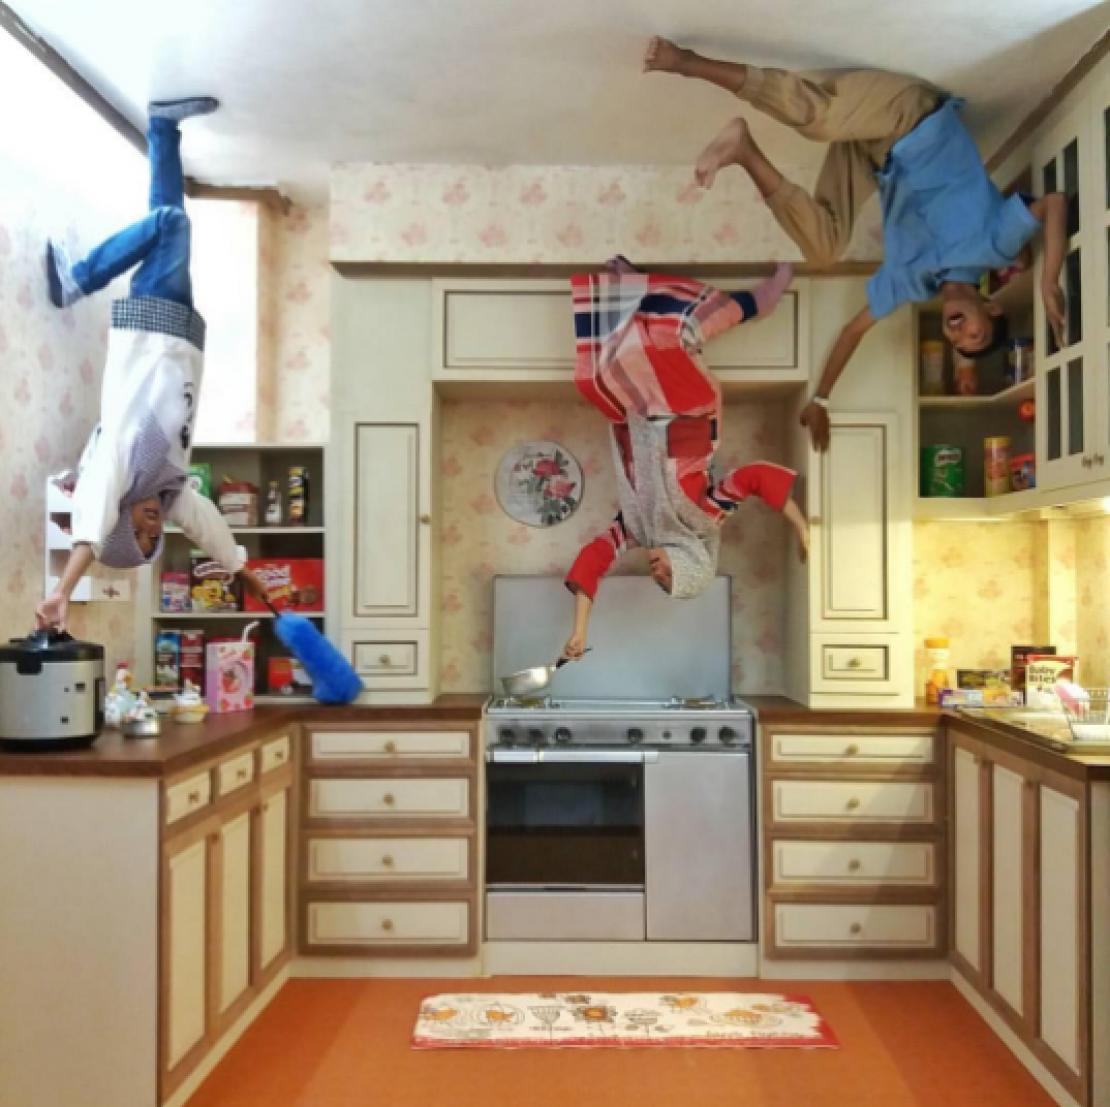 Segmen Dapur - Sumber: papasemar.com